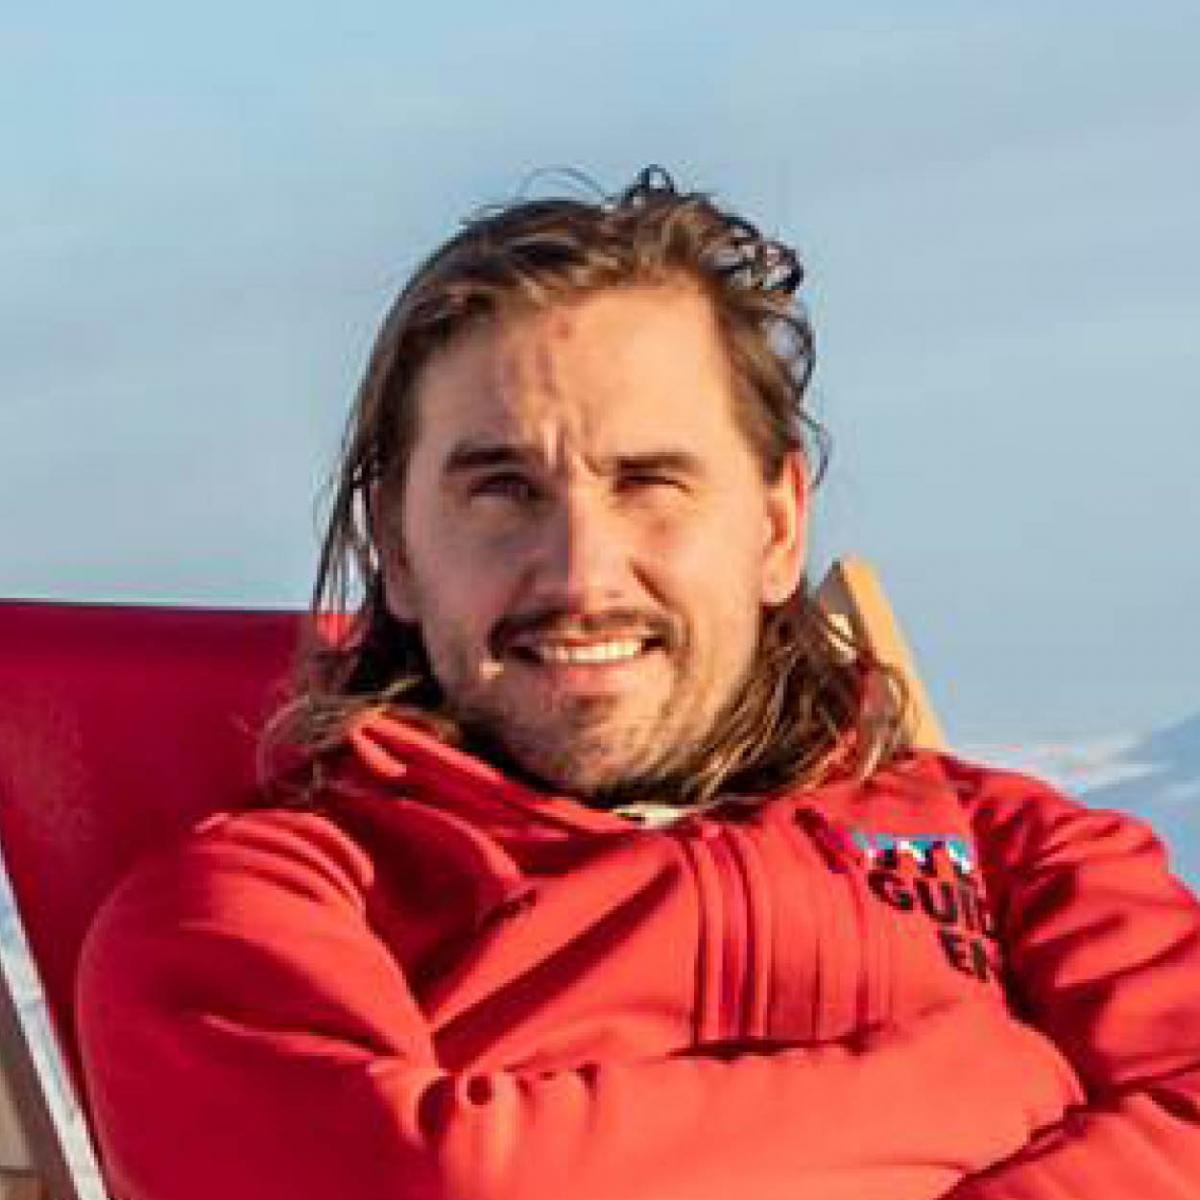 Oscar Almgren Owner / CEO i Uteguiden